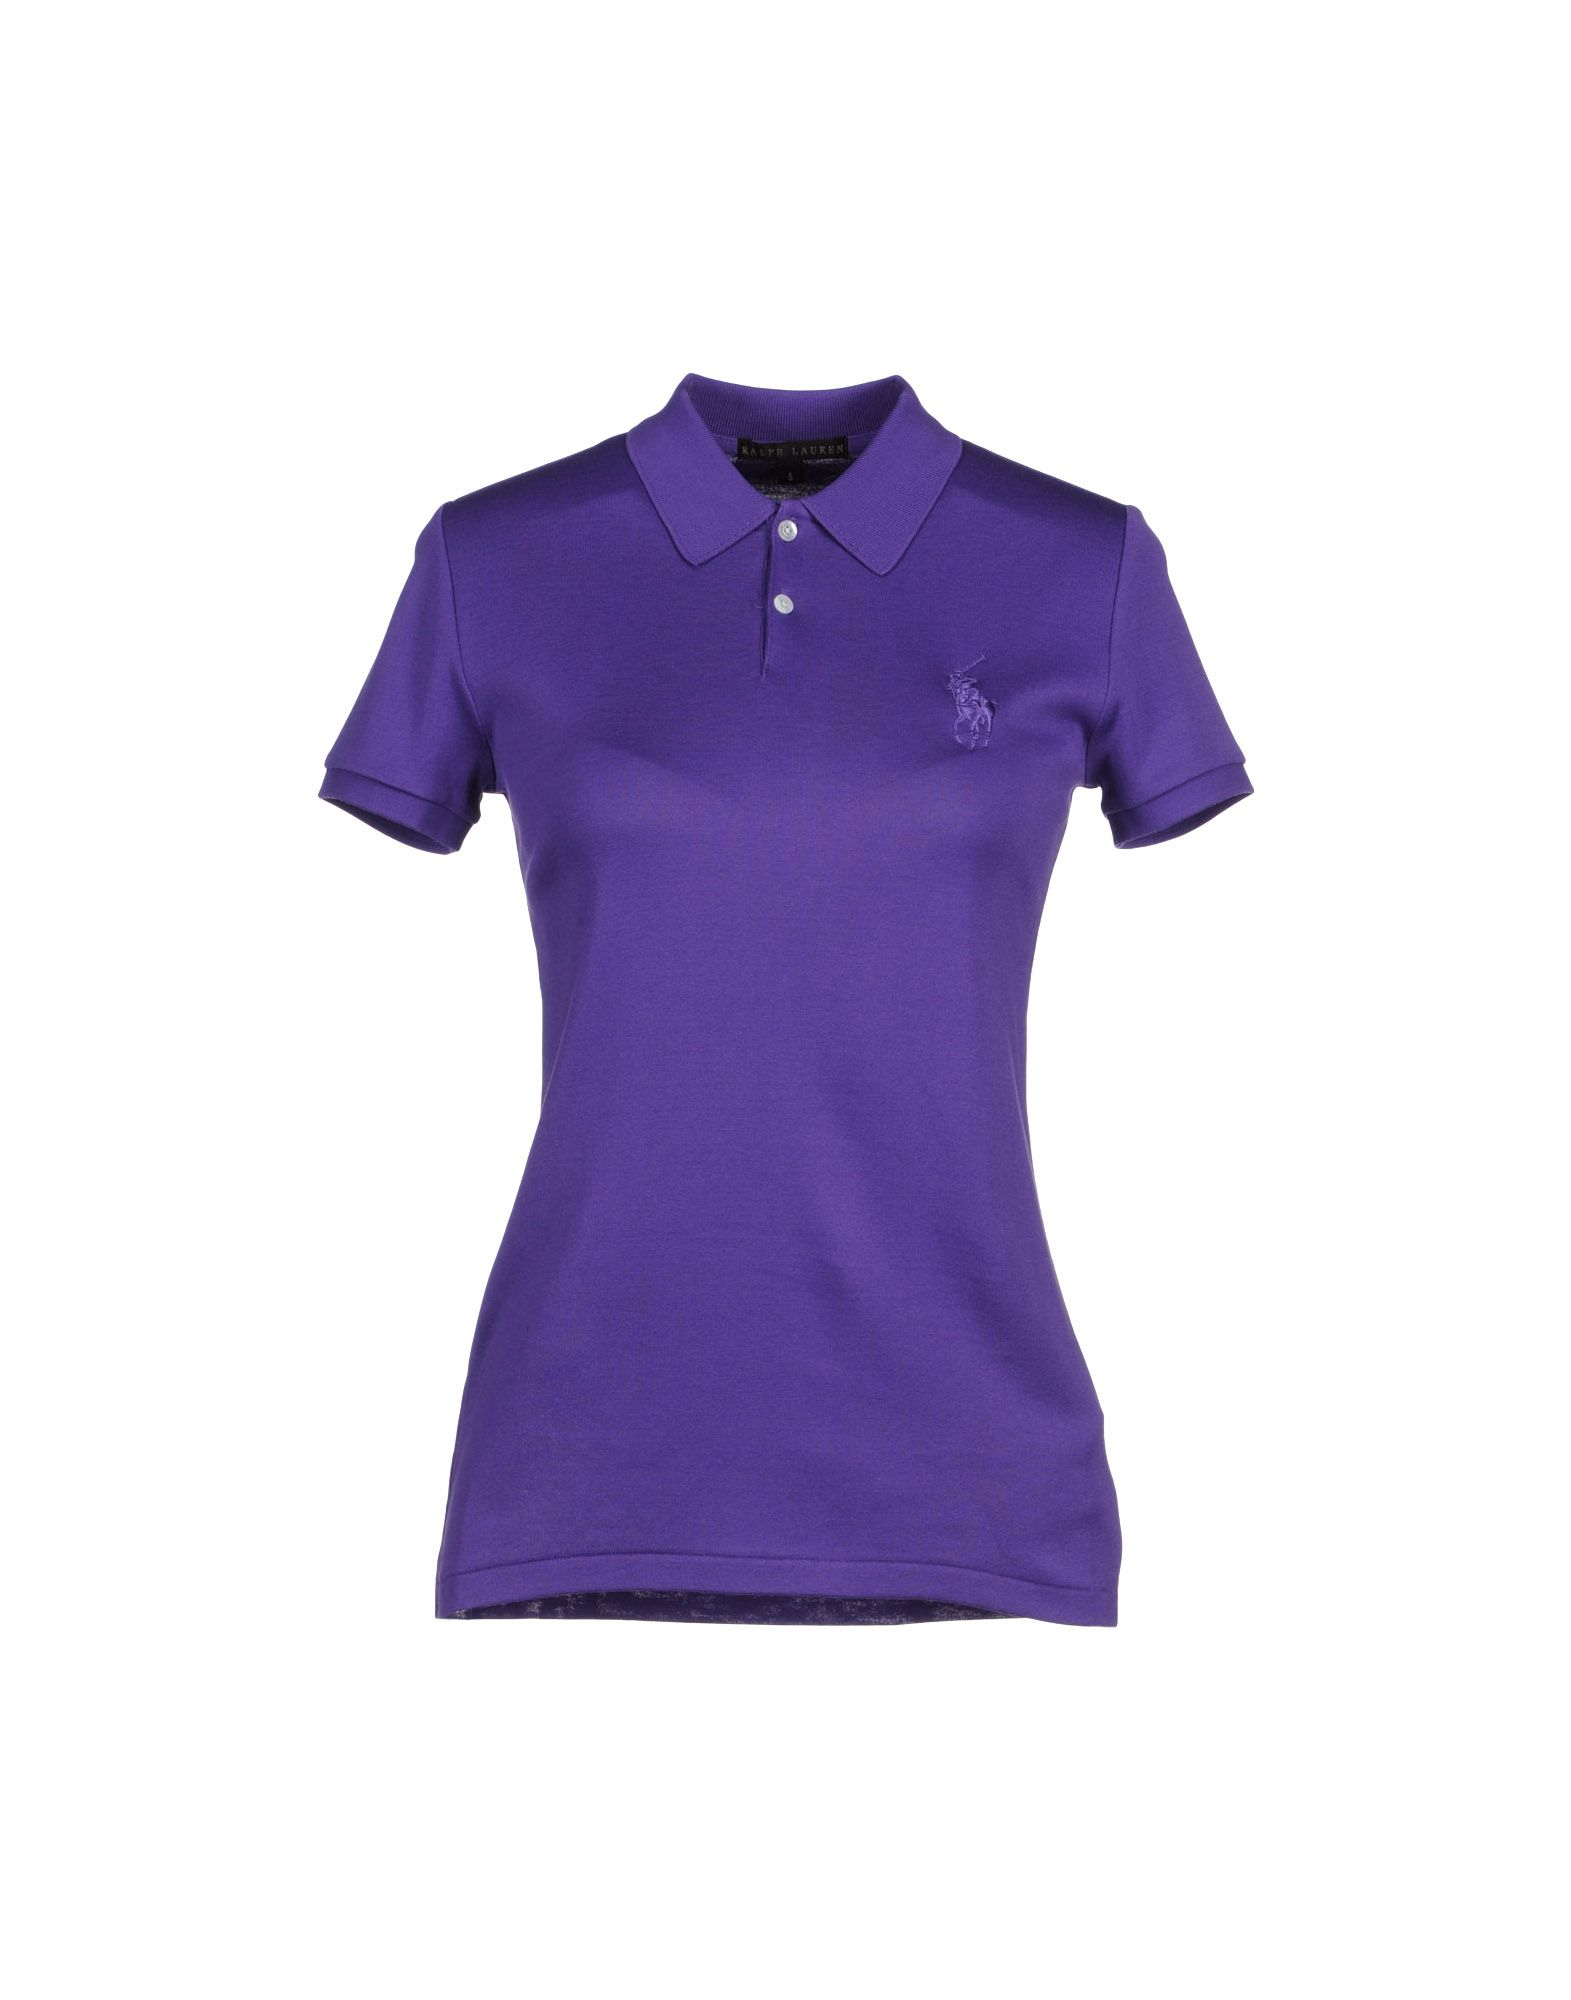 Ralph lauren black label polo shirts in purple dark for Ralph lauren black label polo shirt